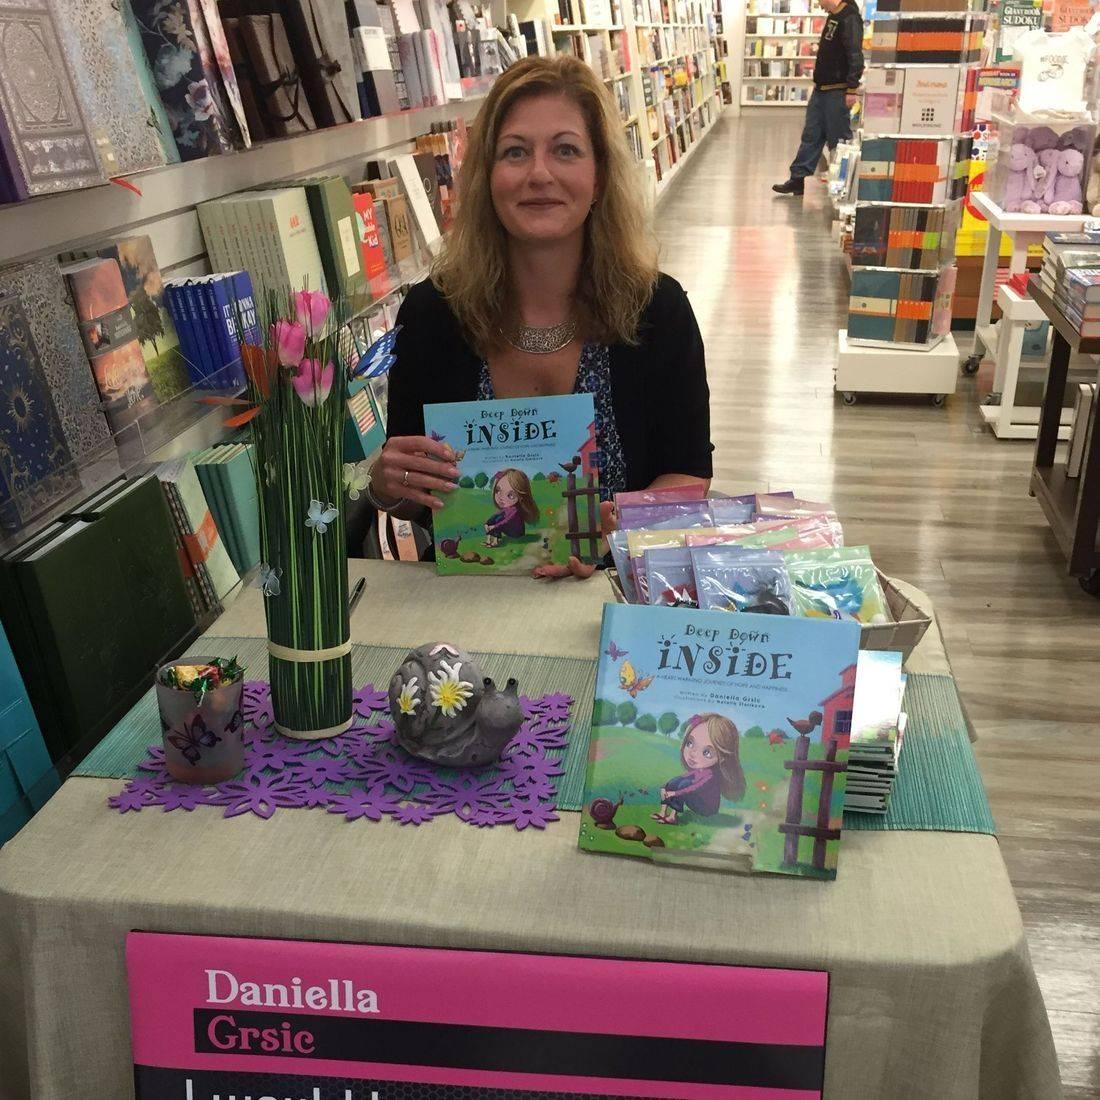 Books by Daniella Grsic